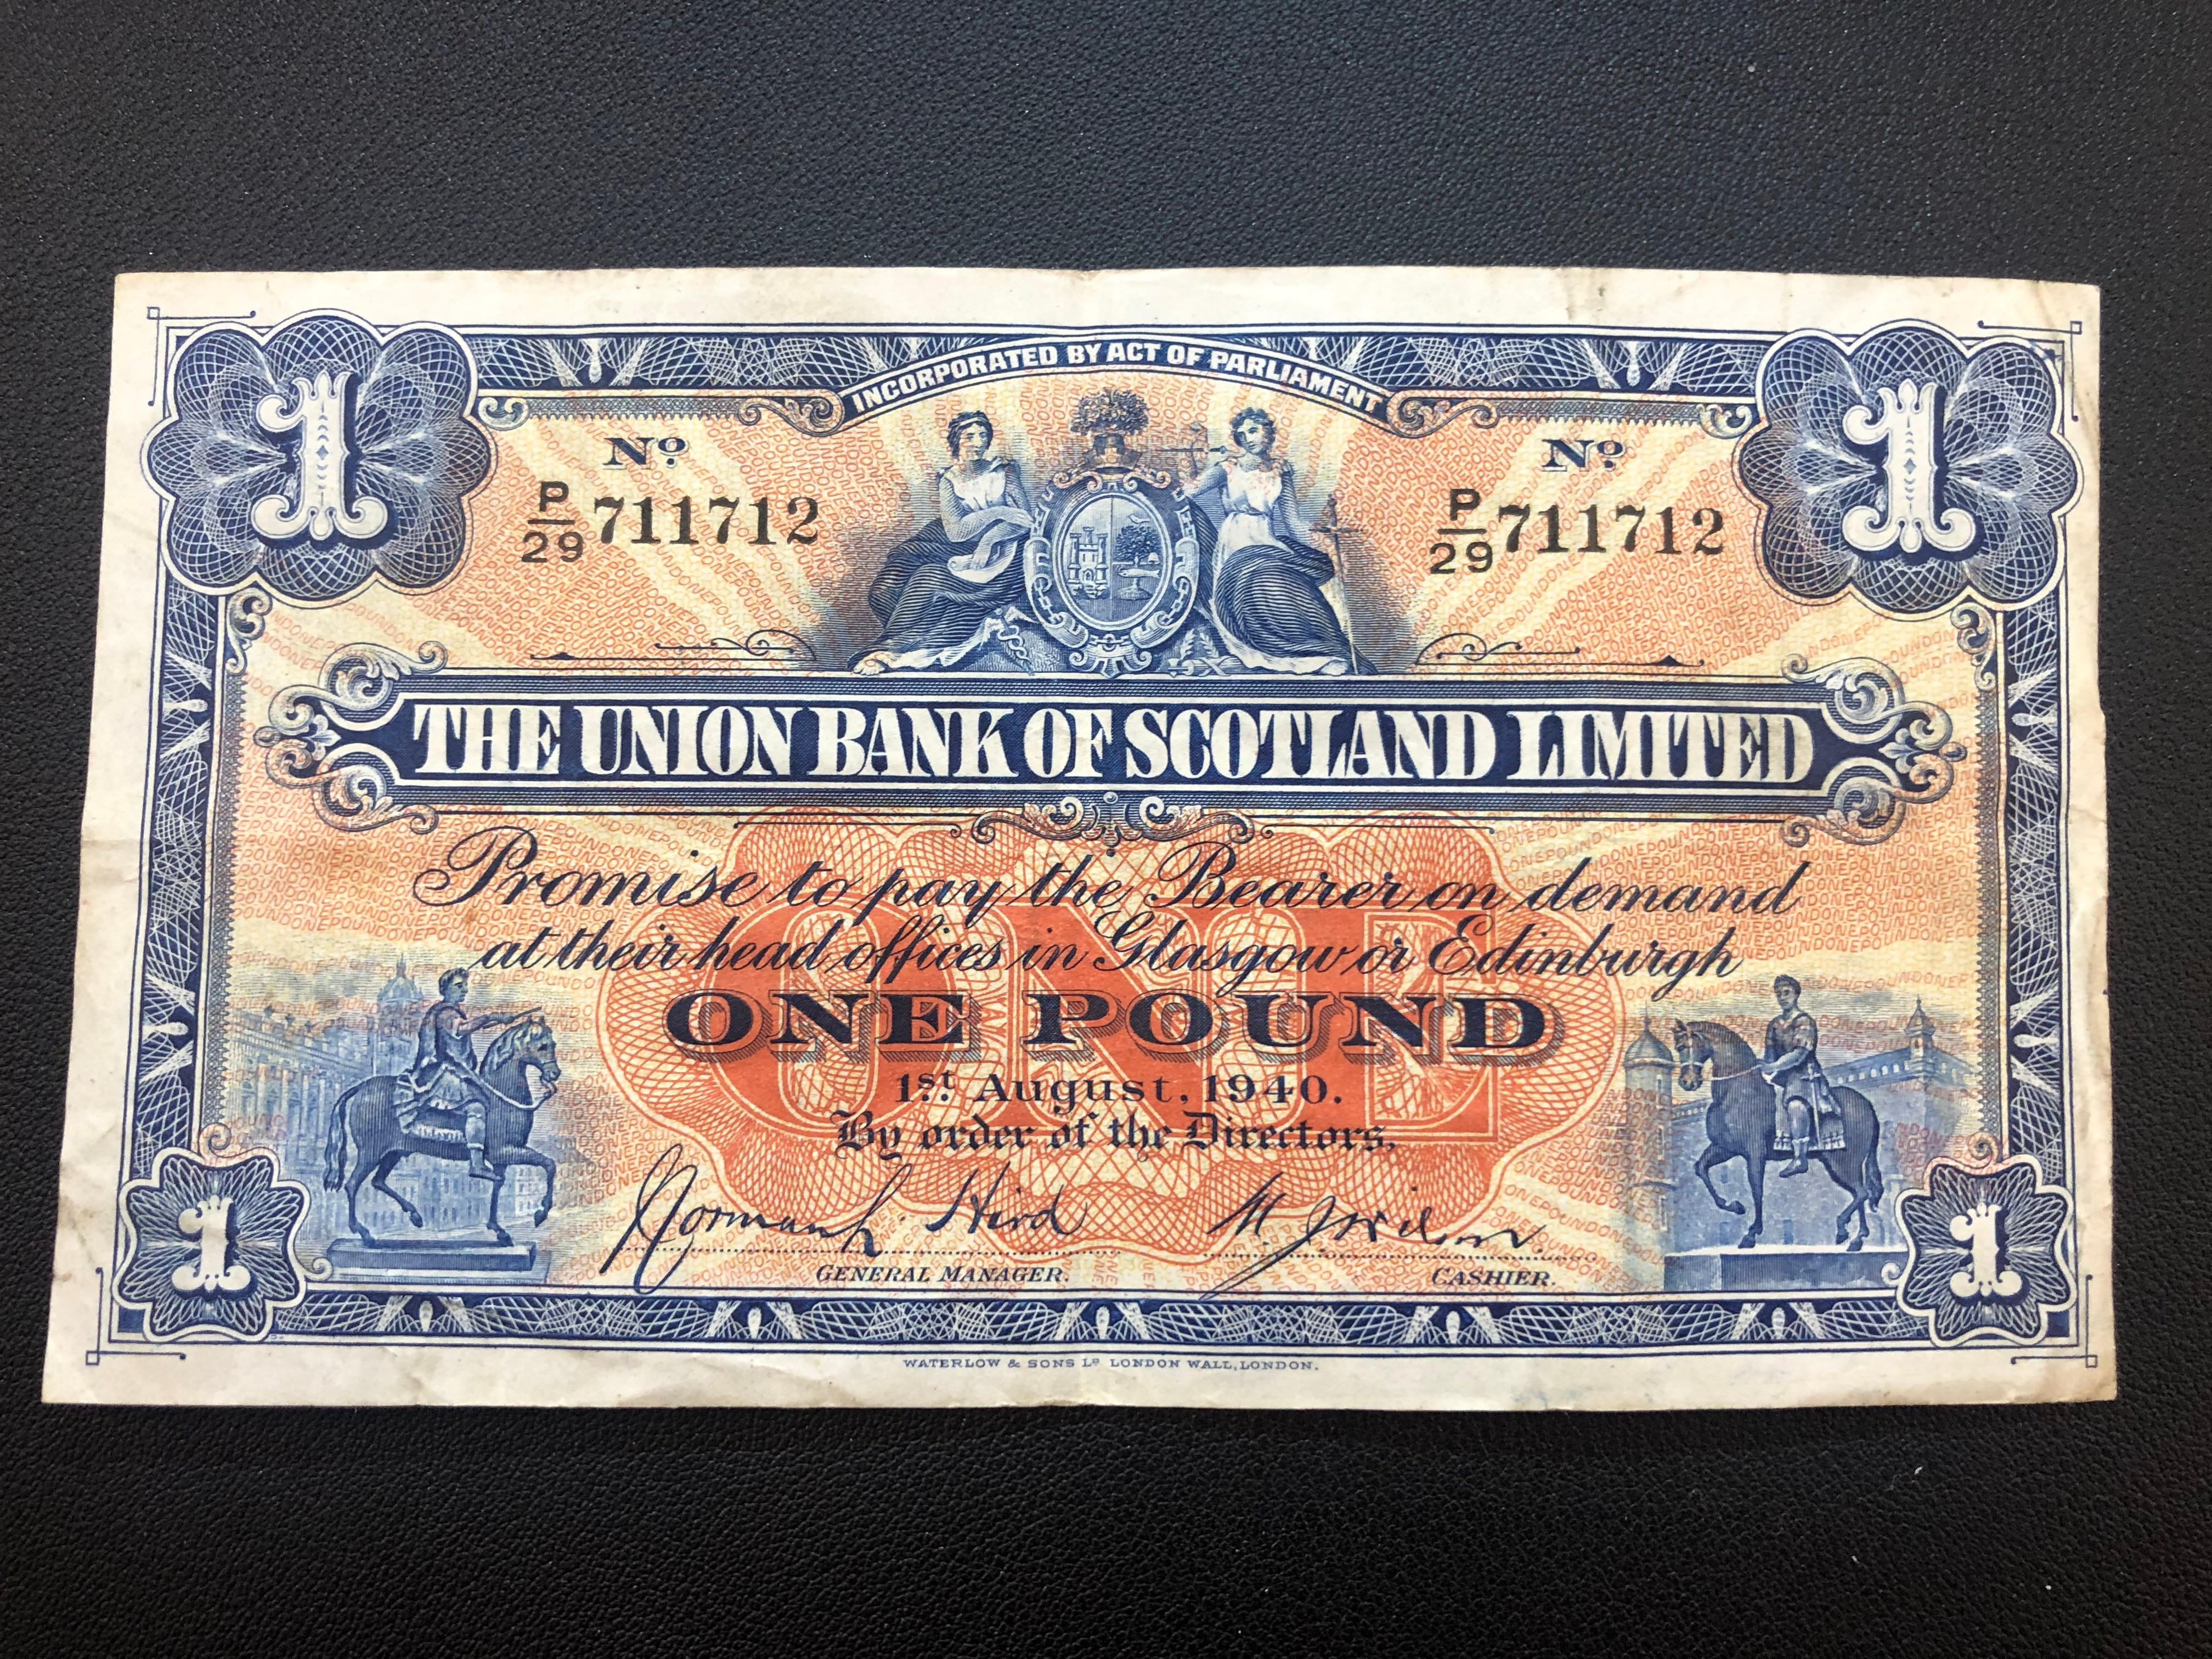 Scotland 1 Pound 1940 S815c Union Bank of Scotland.jpg